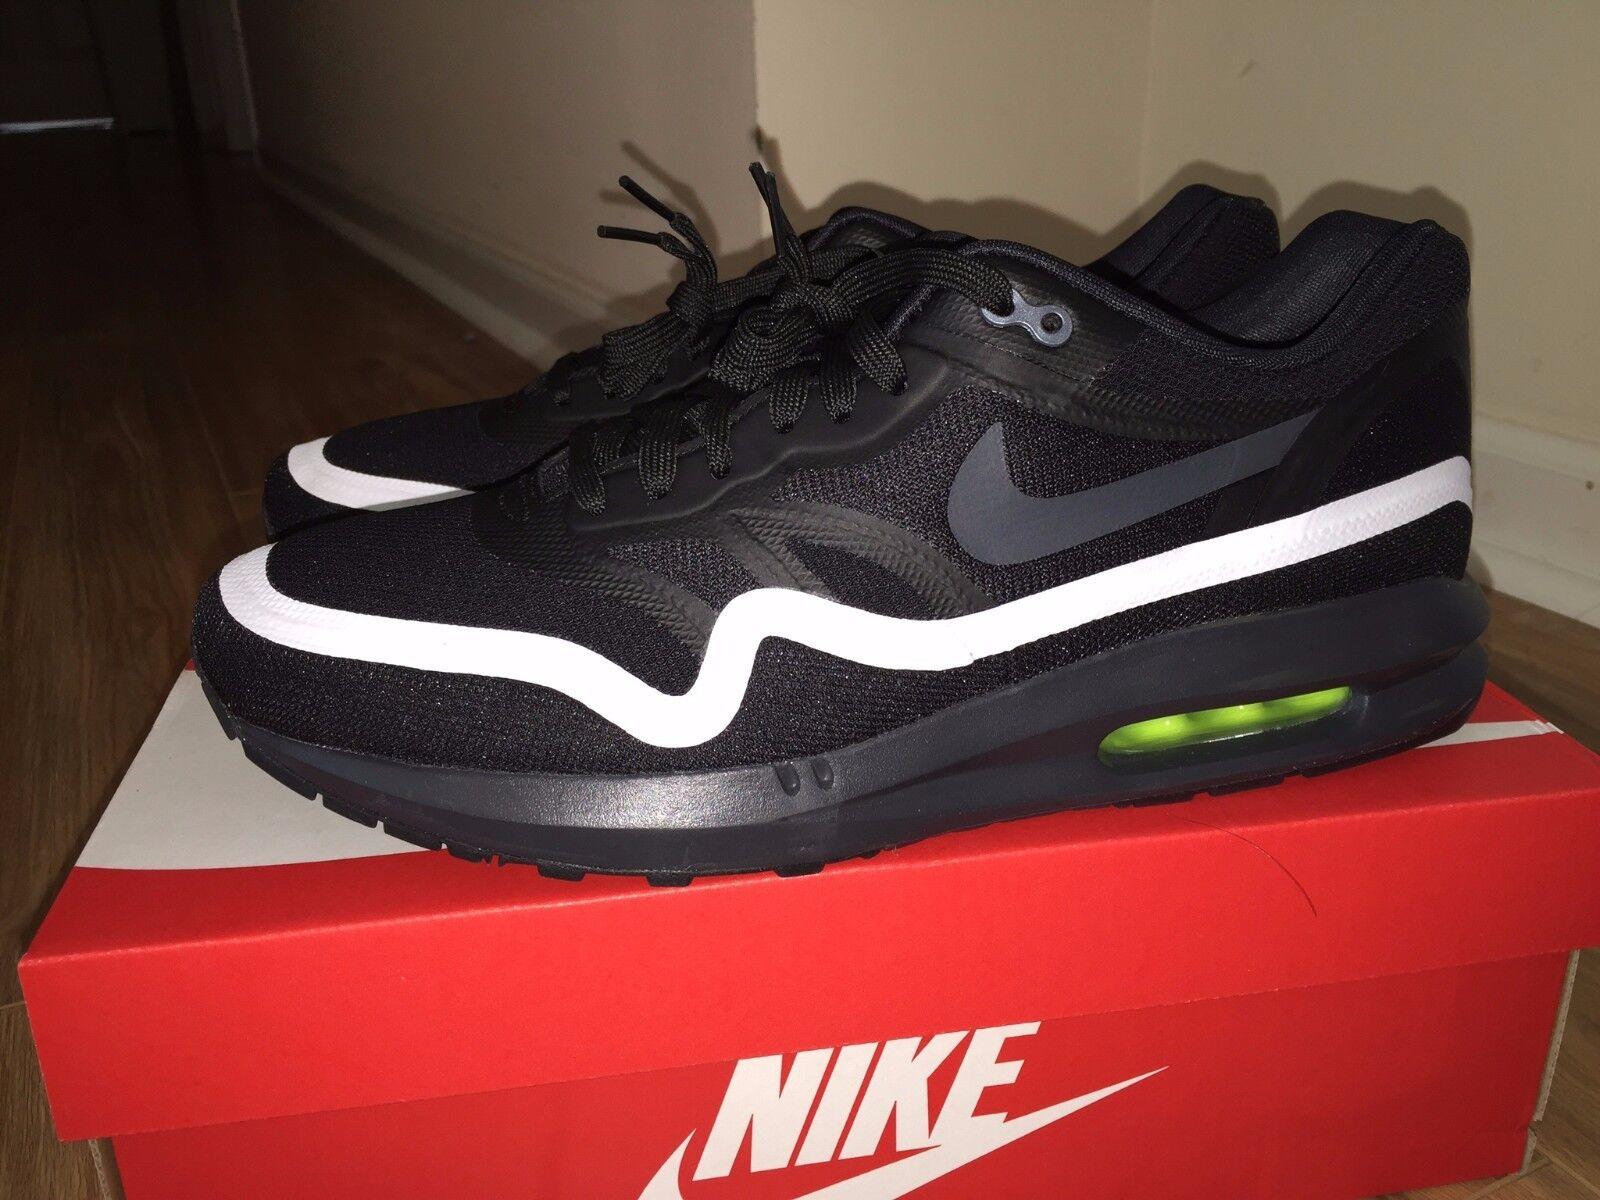 Nike Men Air Max Lunar1 Black White Anthracite Volt Running 654469-003 Brand New